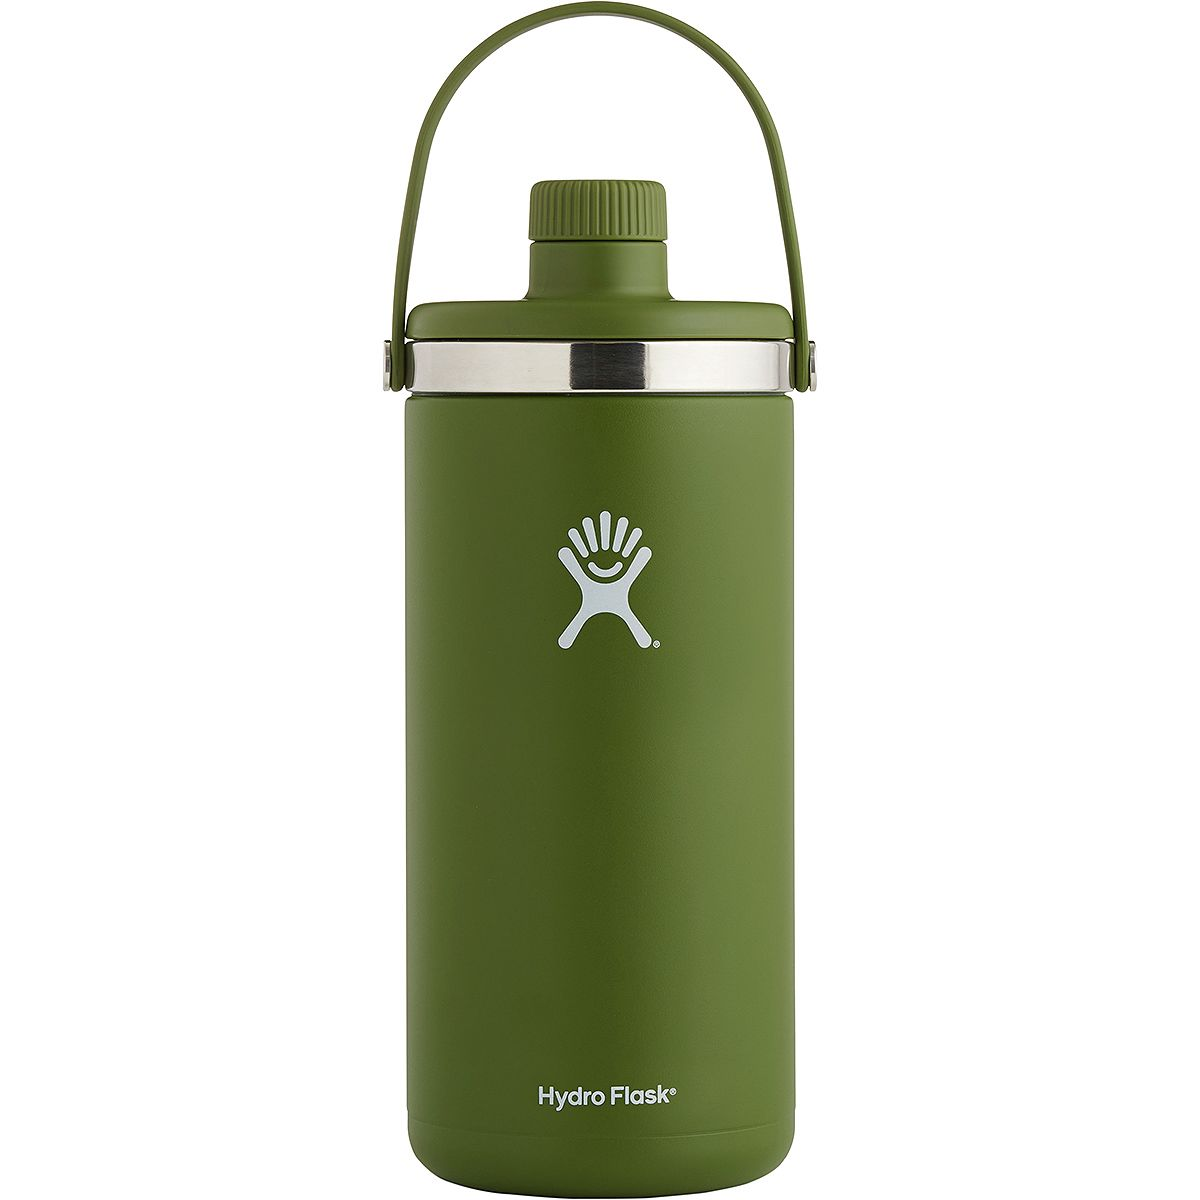 Hydro Flask 128 oz Oasis